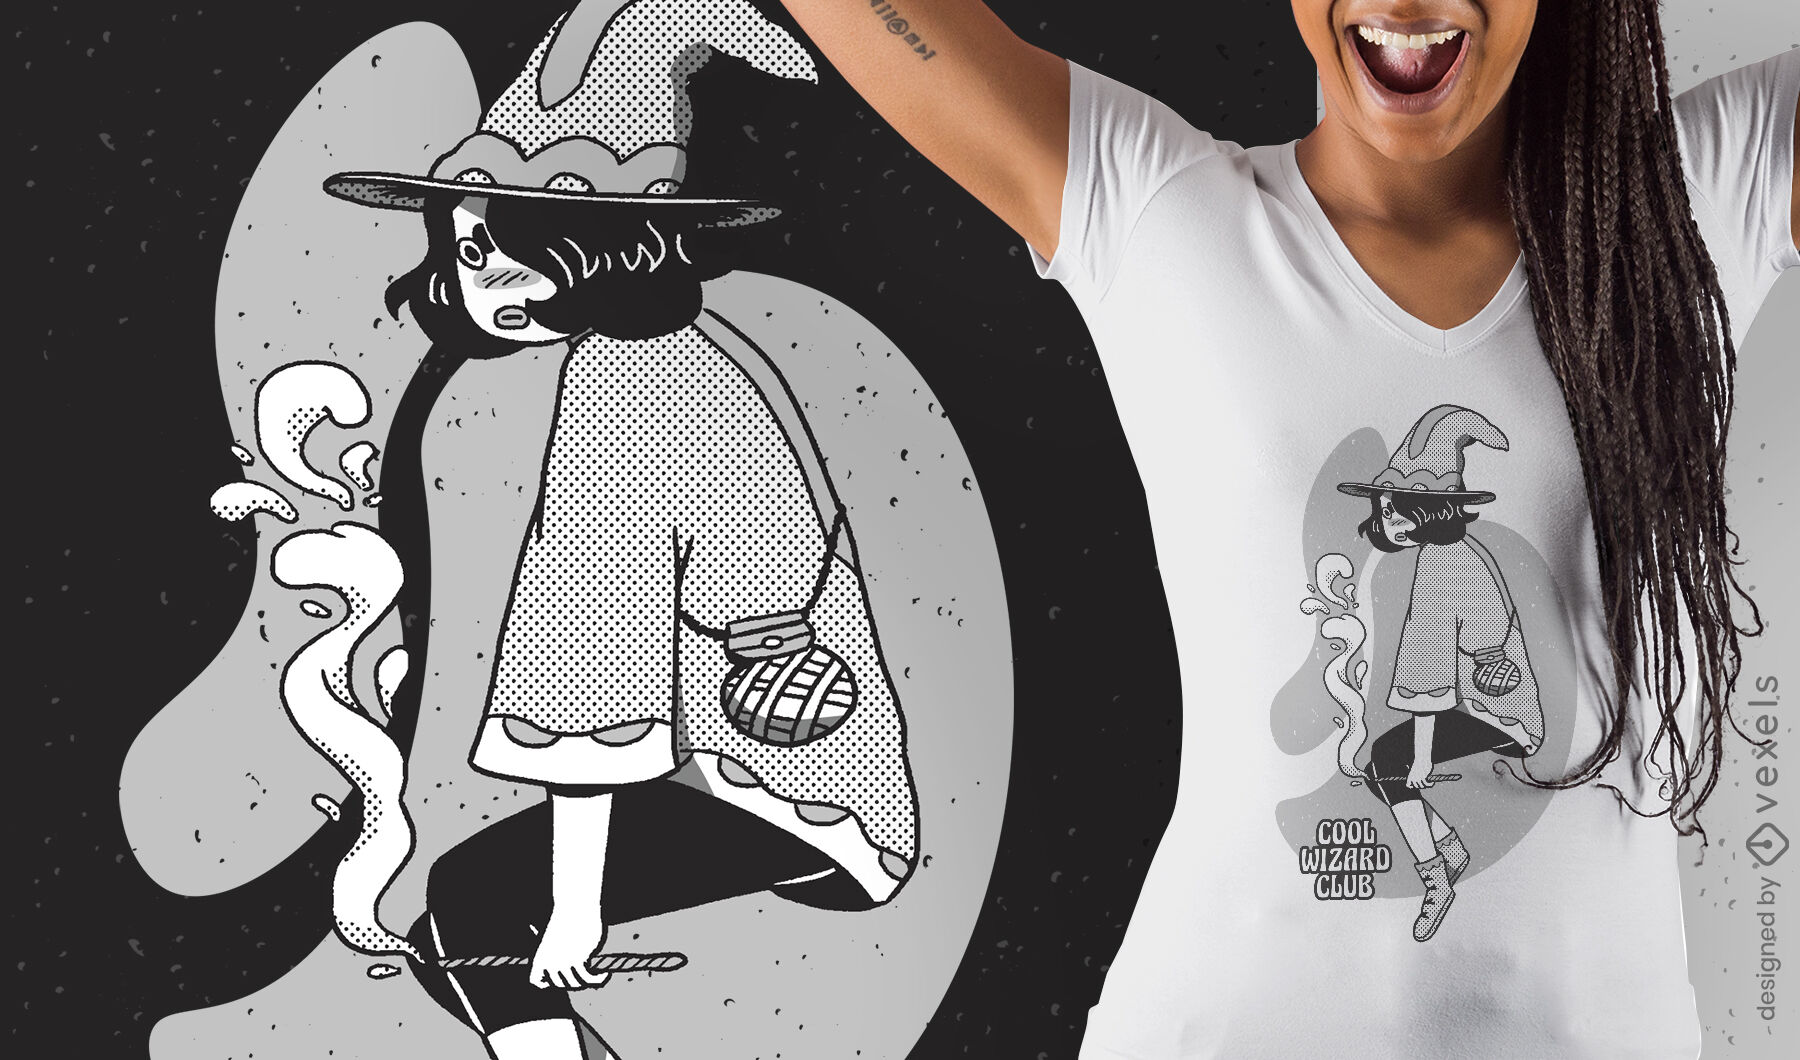 Diseño de camiseta de fantasía de niña mago de dibujos animados